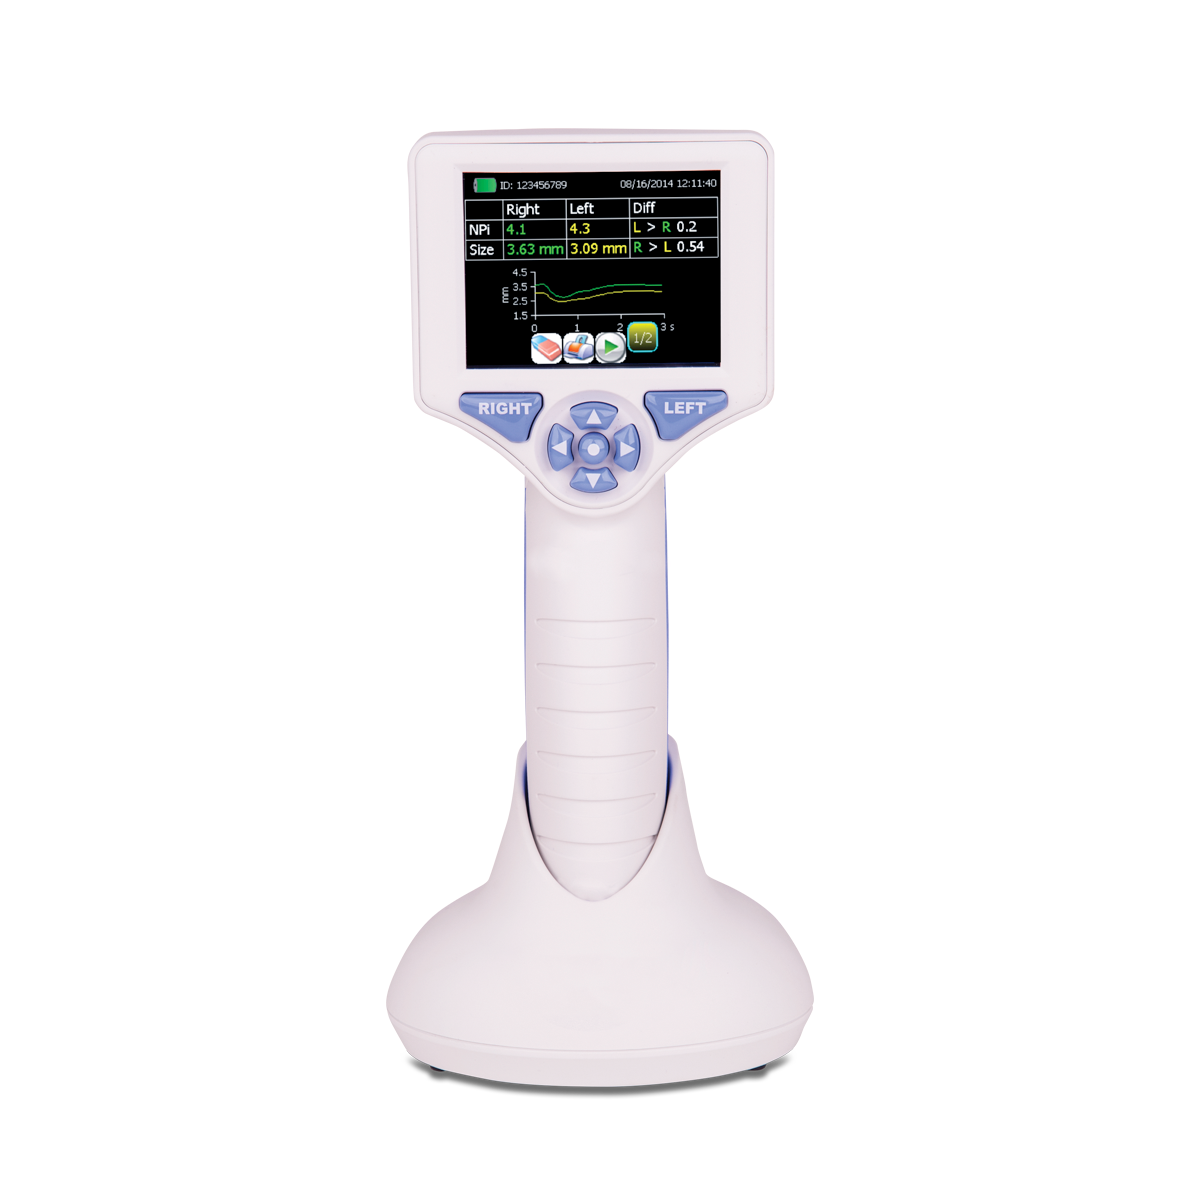 Intracranial pressure monitors